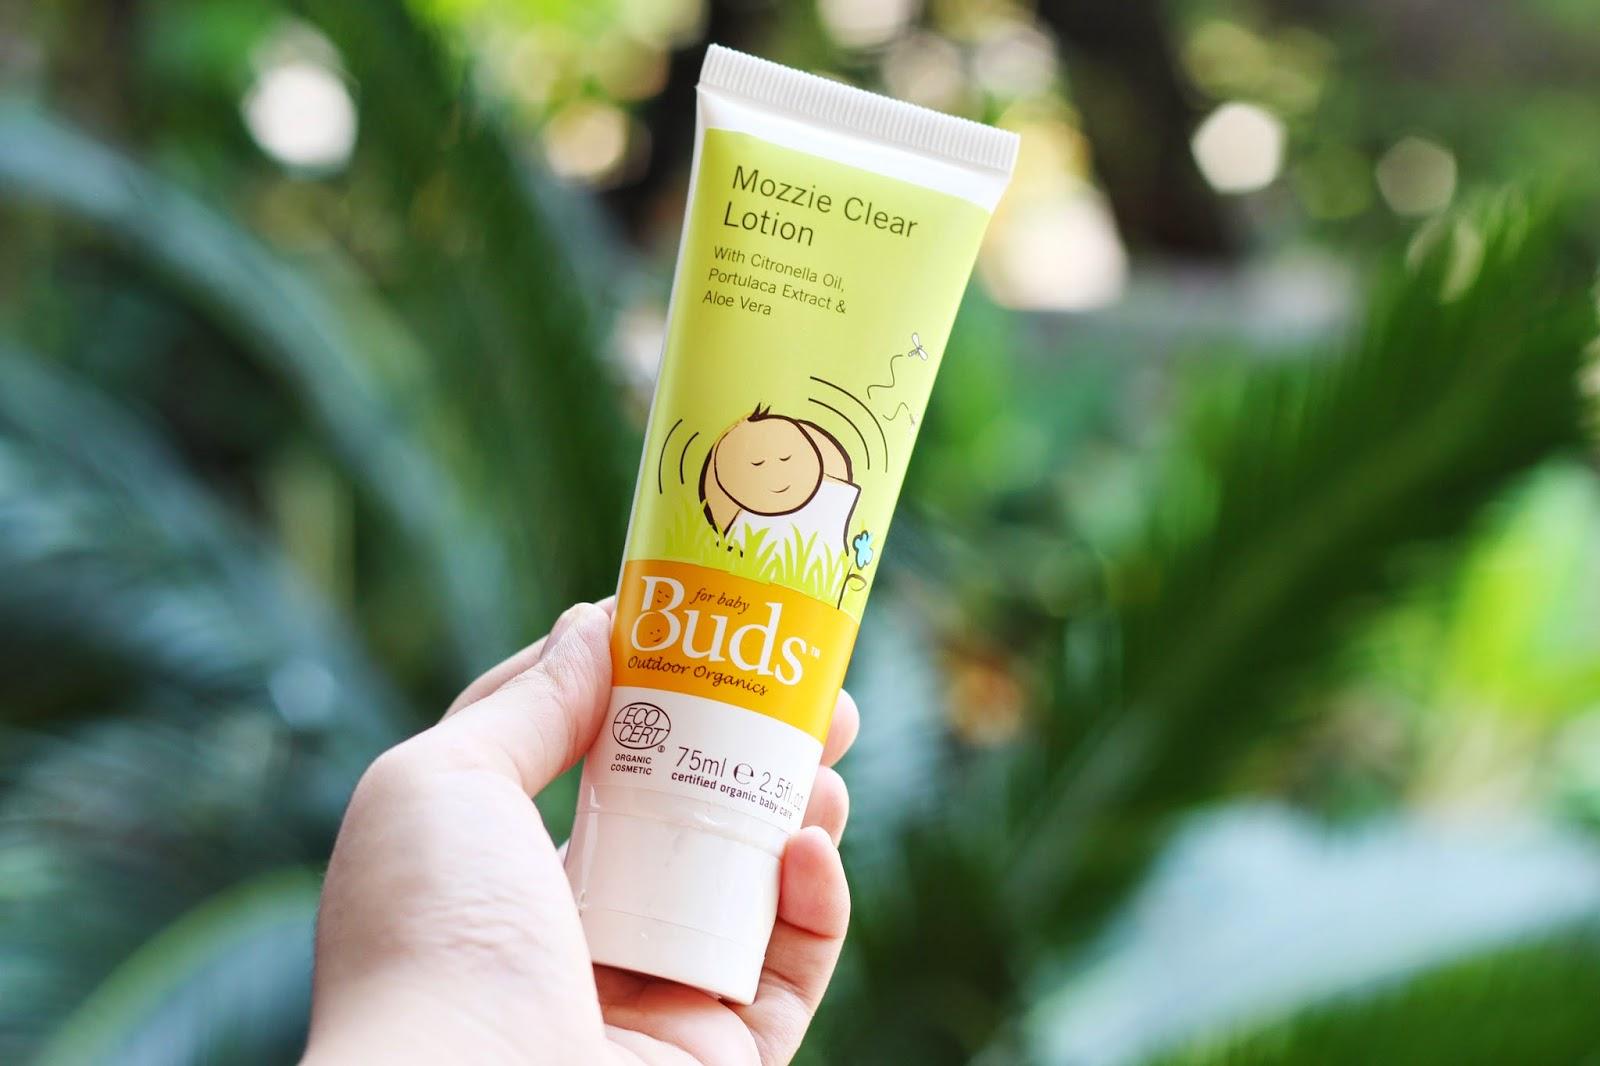 Green Lifestyle With Buds Organics Family And Blog Mozzie Clear Spray 100ml Tidak Terlalu Panas Di Kulit Si Kecil Daya Tahannya Juga Cukup Lama Sehingga Perlu Terus Menerus Dioles Seperti Brand Yang Saya Pakai Sebelumnya